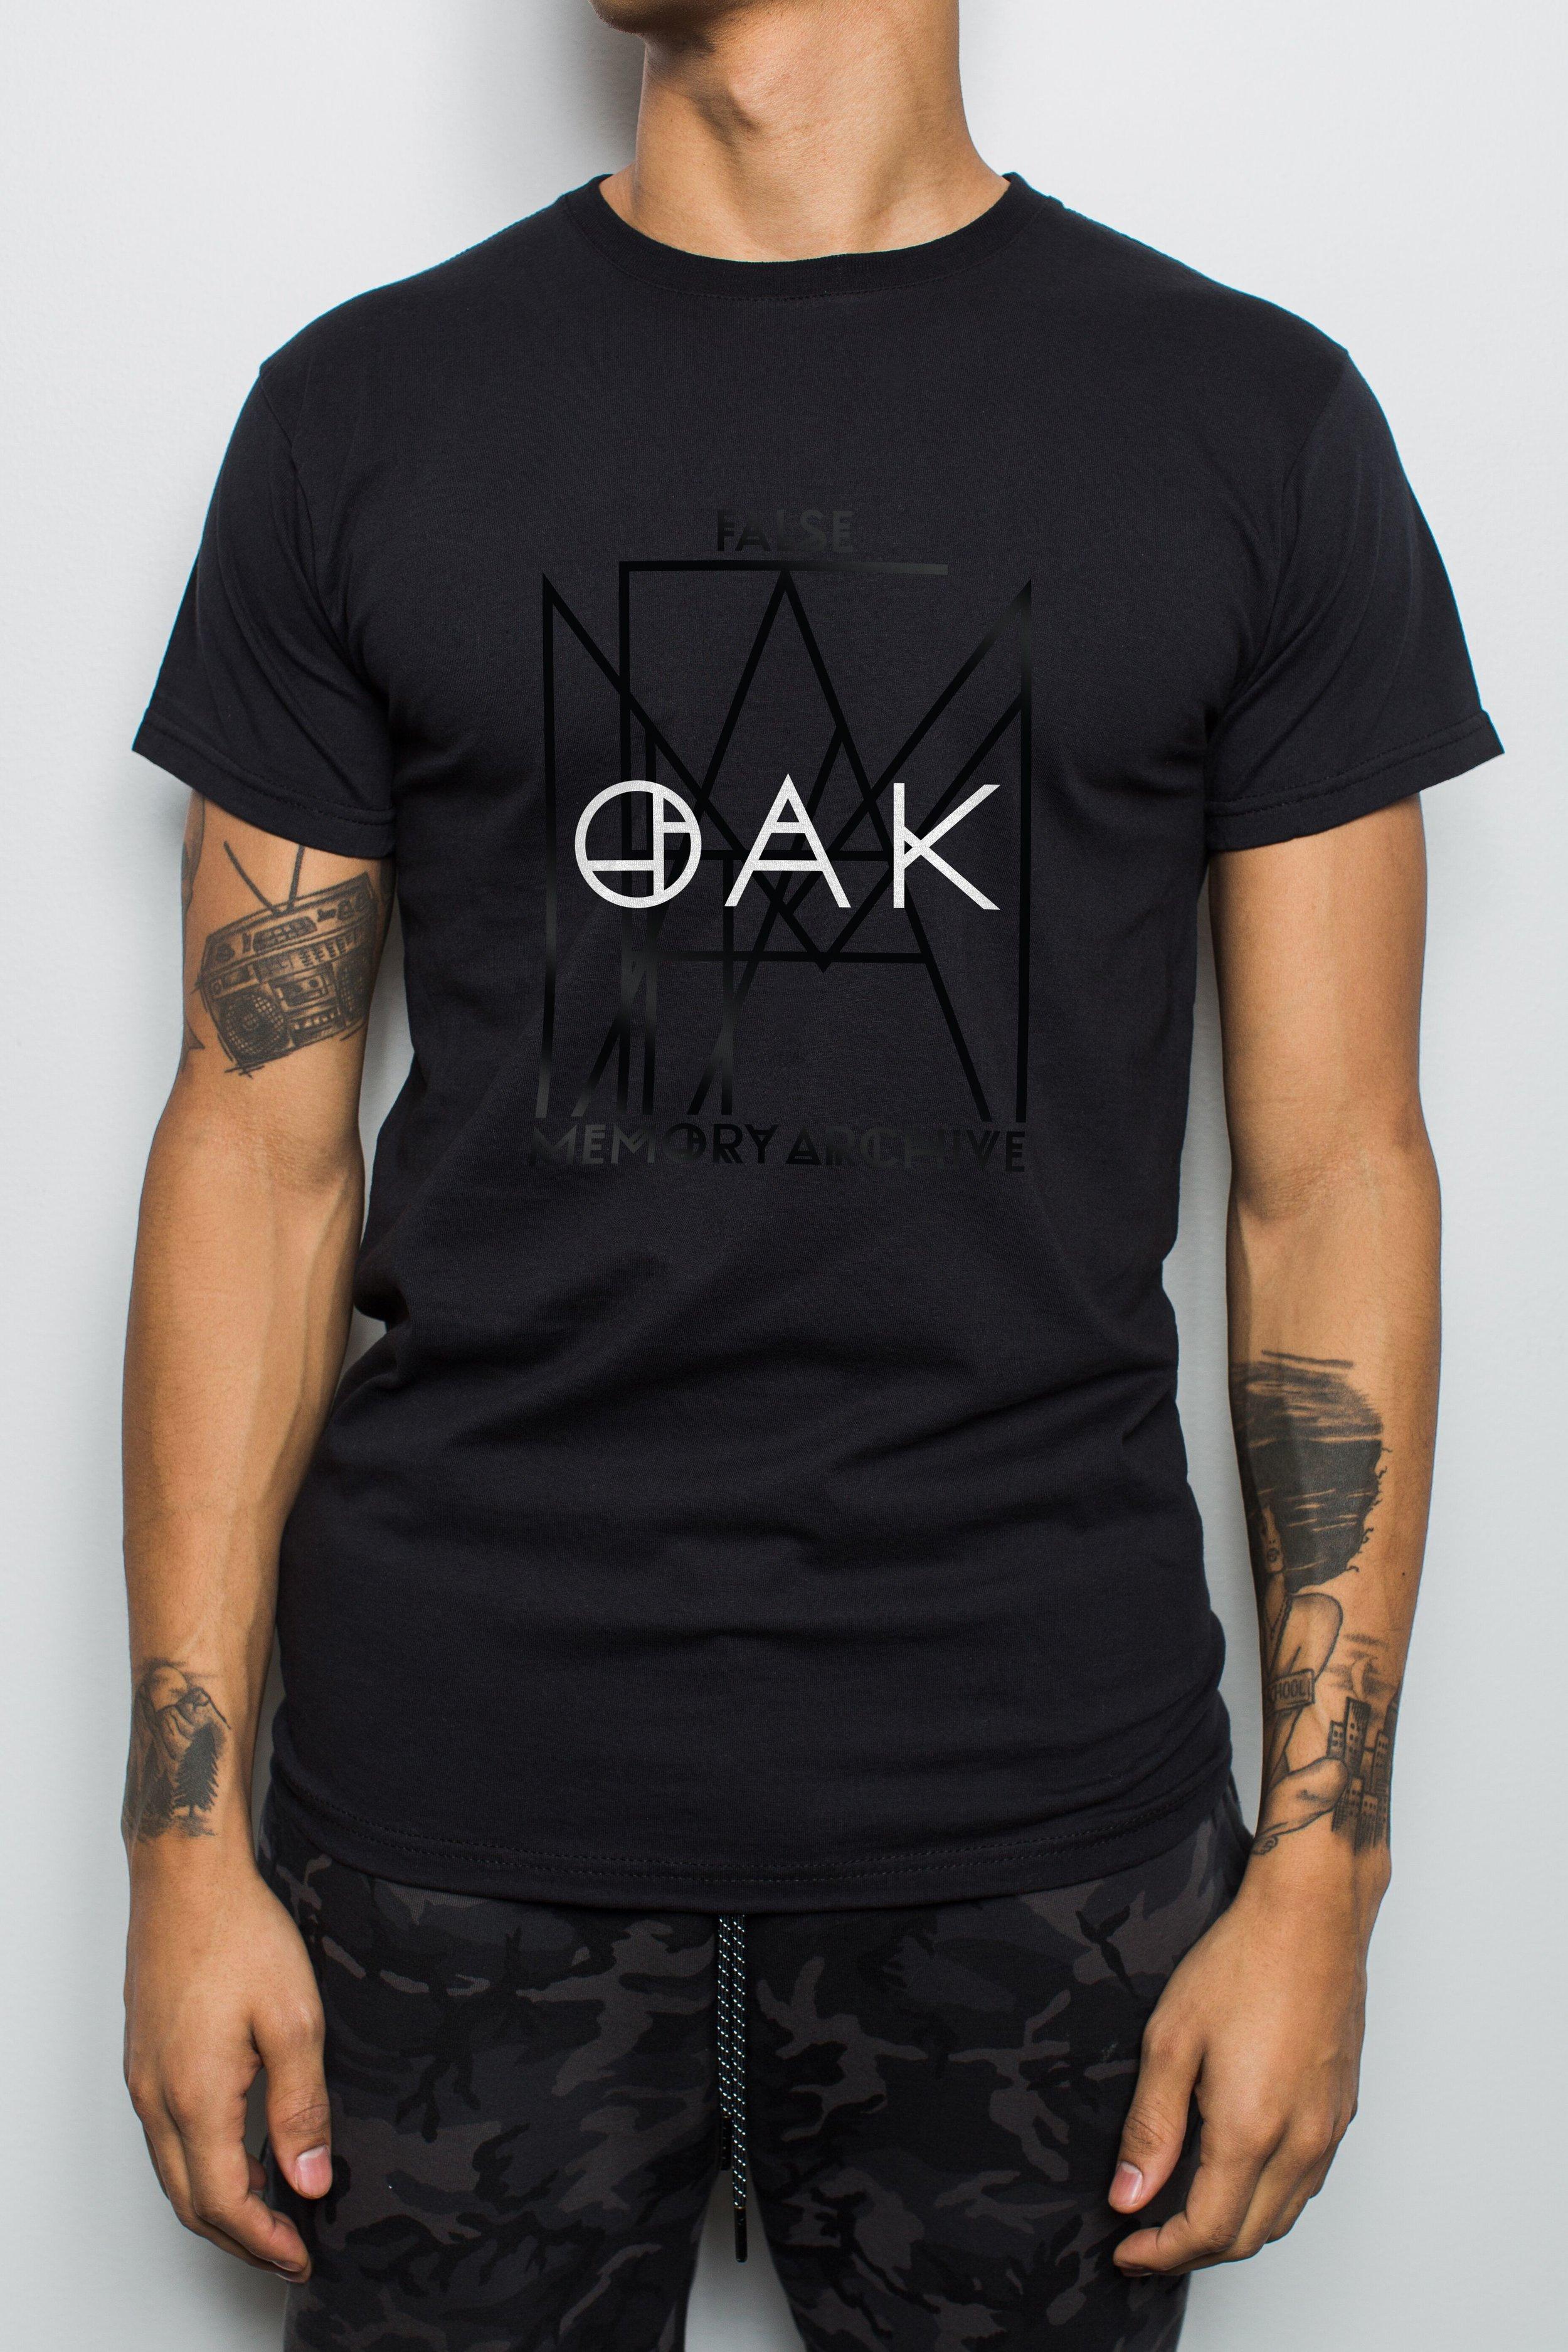 Oak T-shirt.jpeg